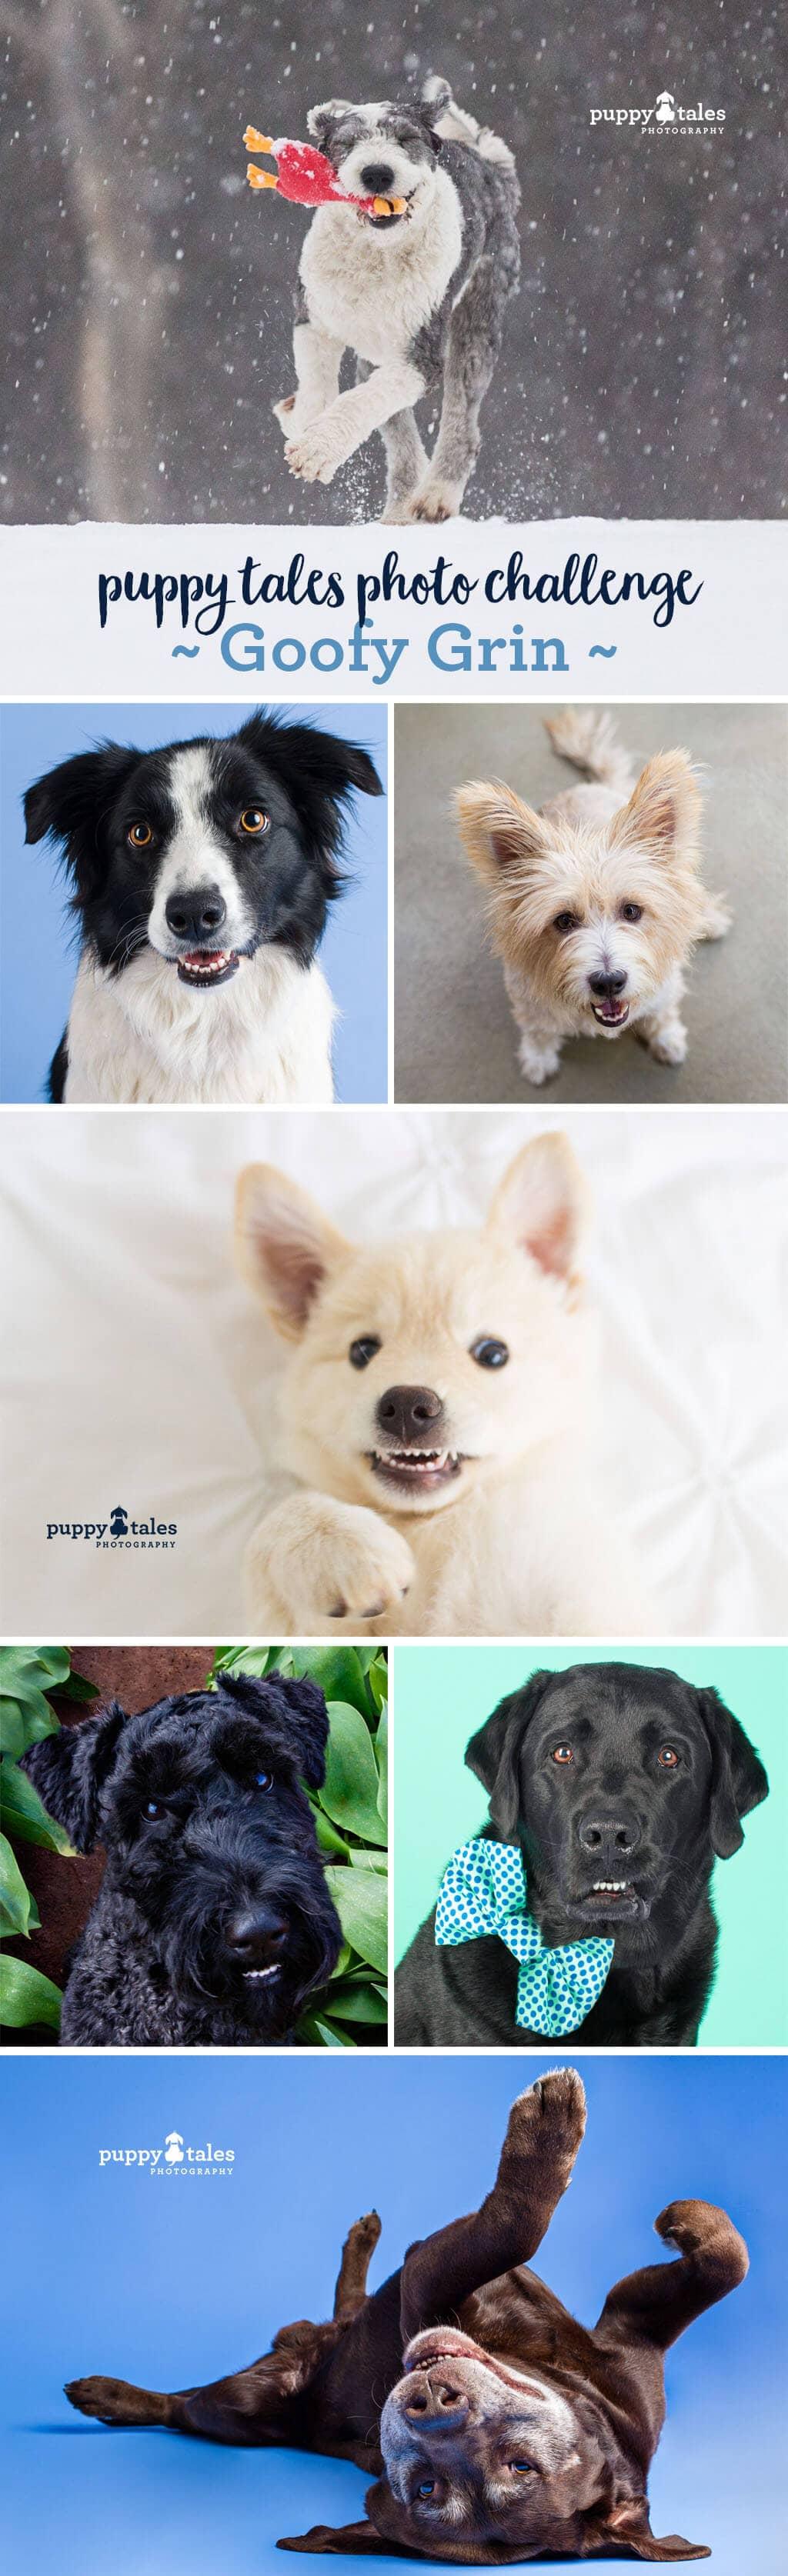 Puppy Tales Photo Challenge ~ Goofy Grin